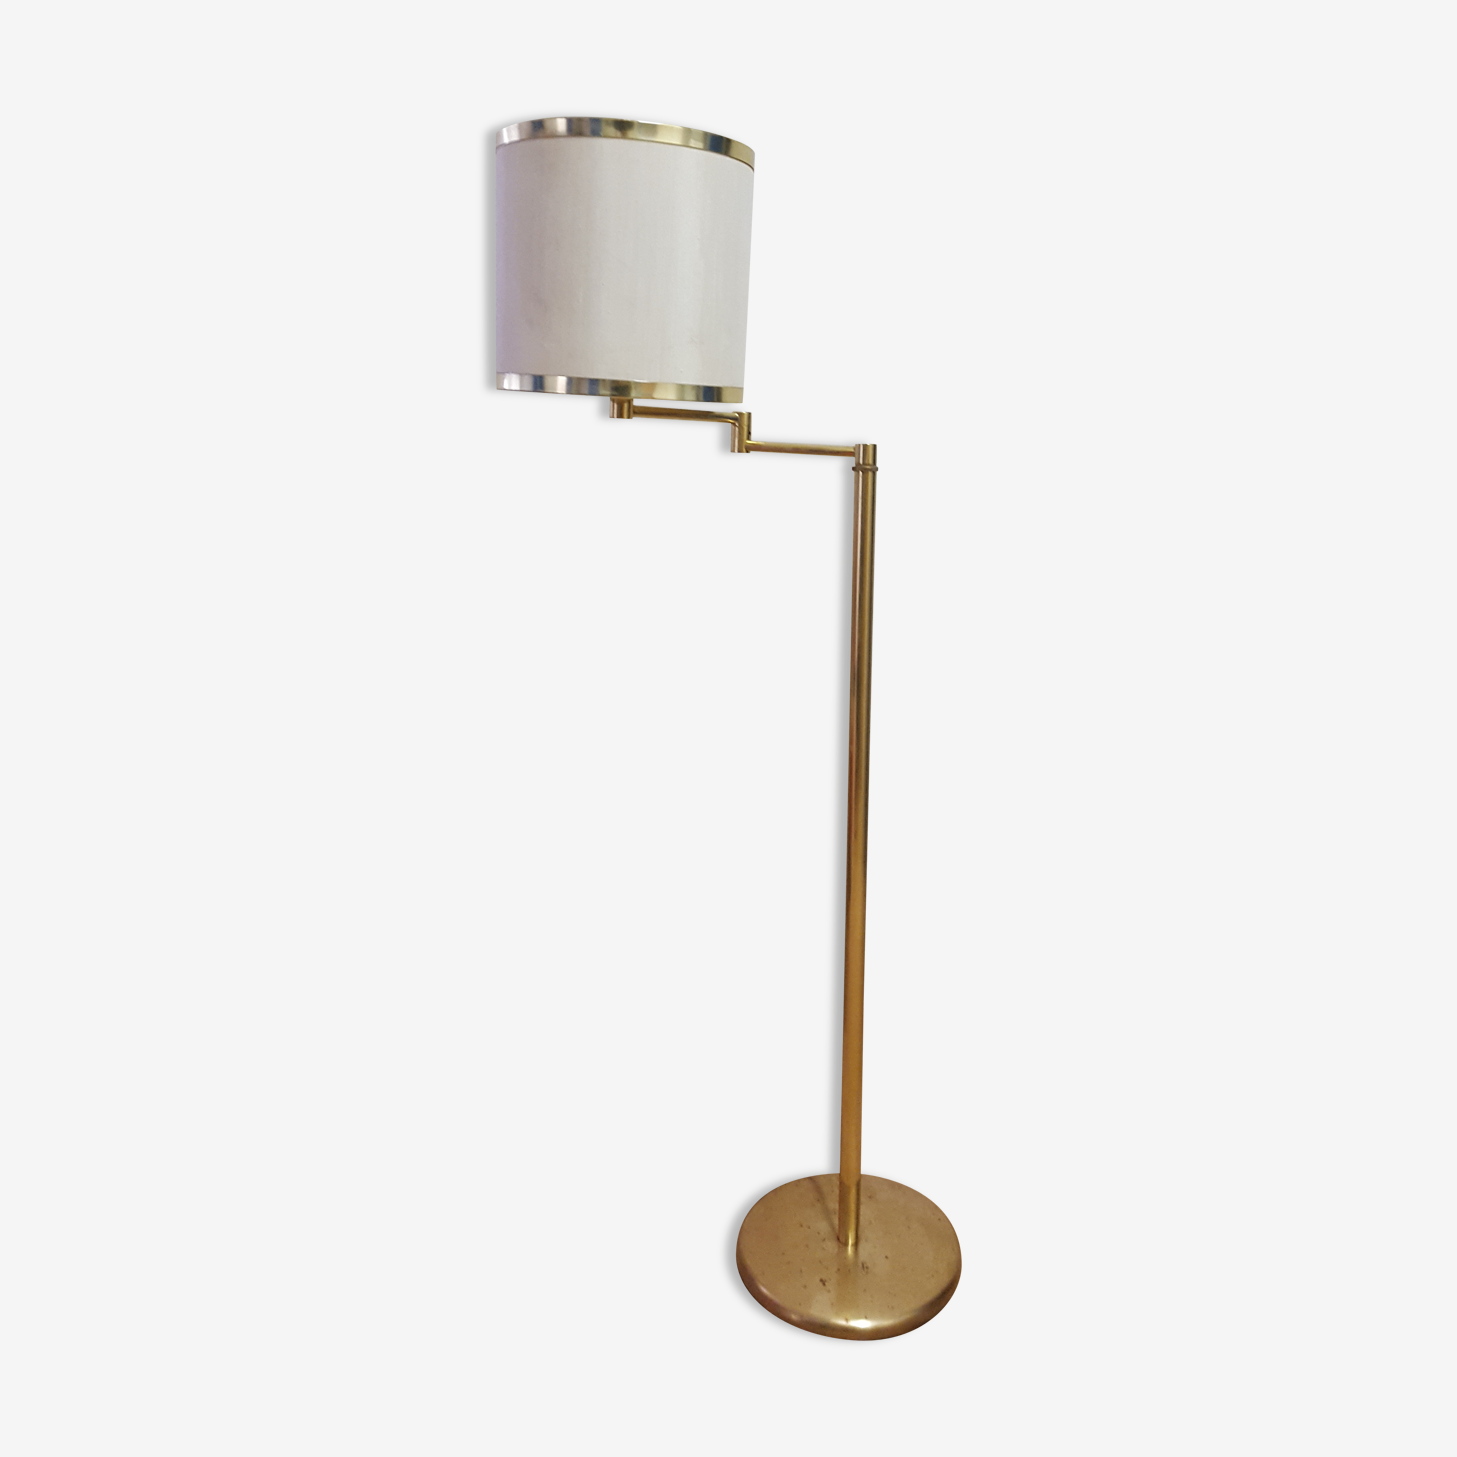 Floor lamp metal golden with articulated arm